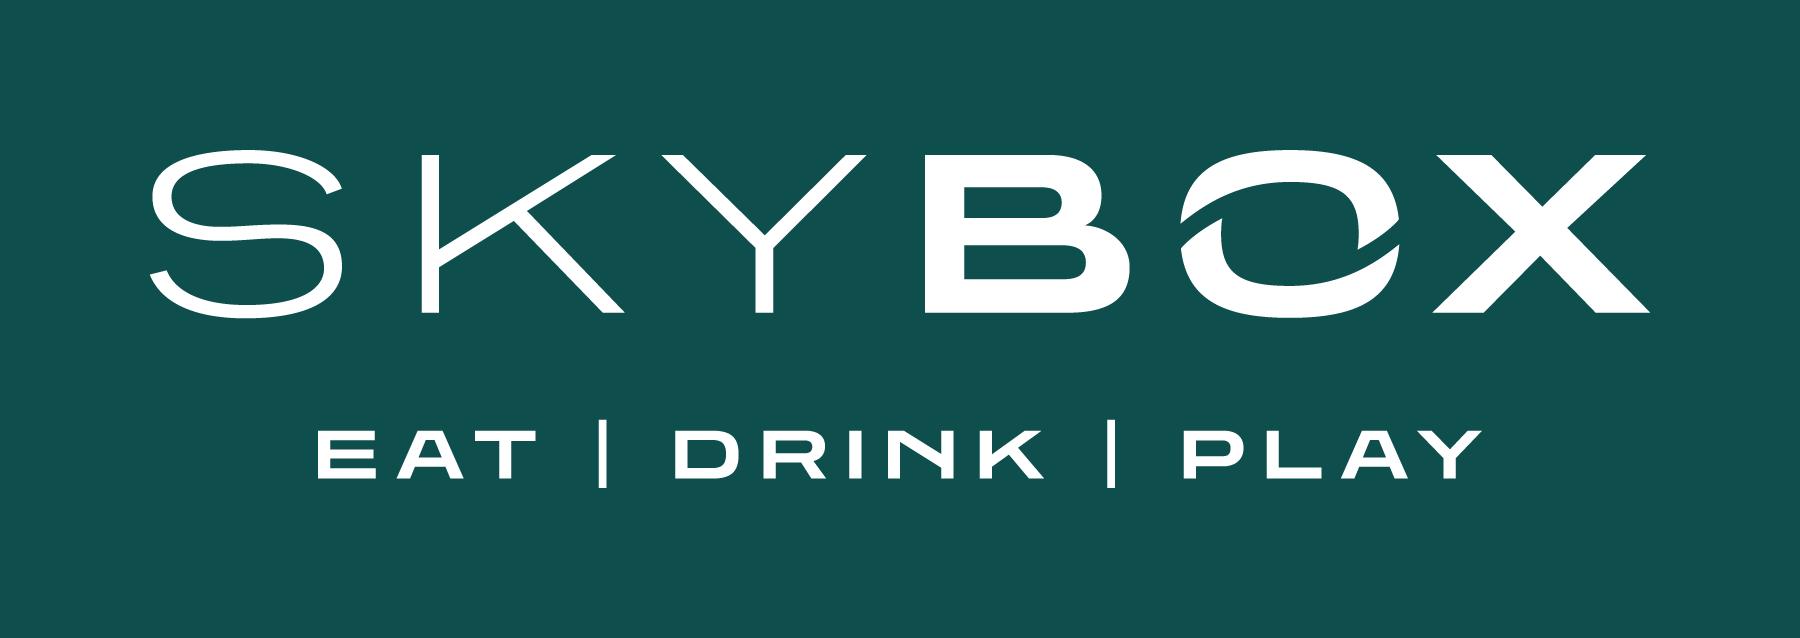 Skybox_Logo_Tagline_RGB-CV.png